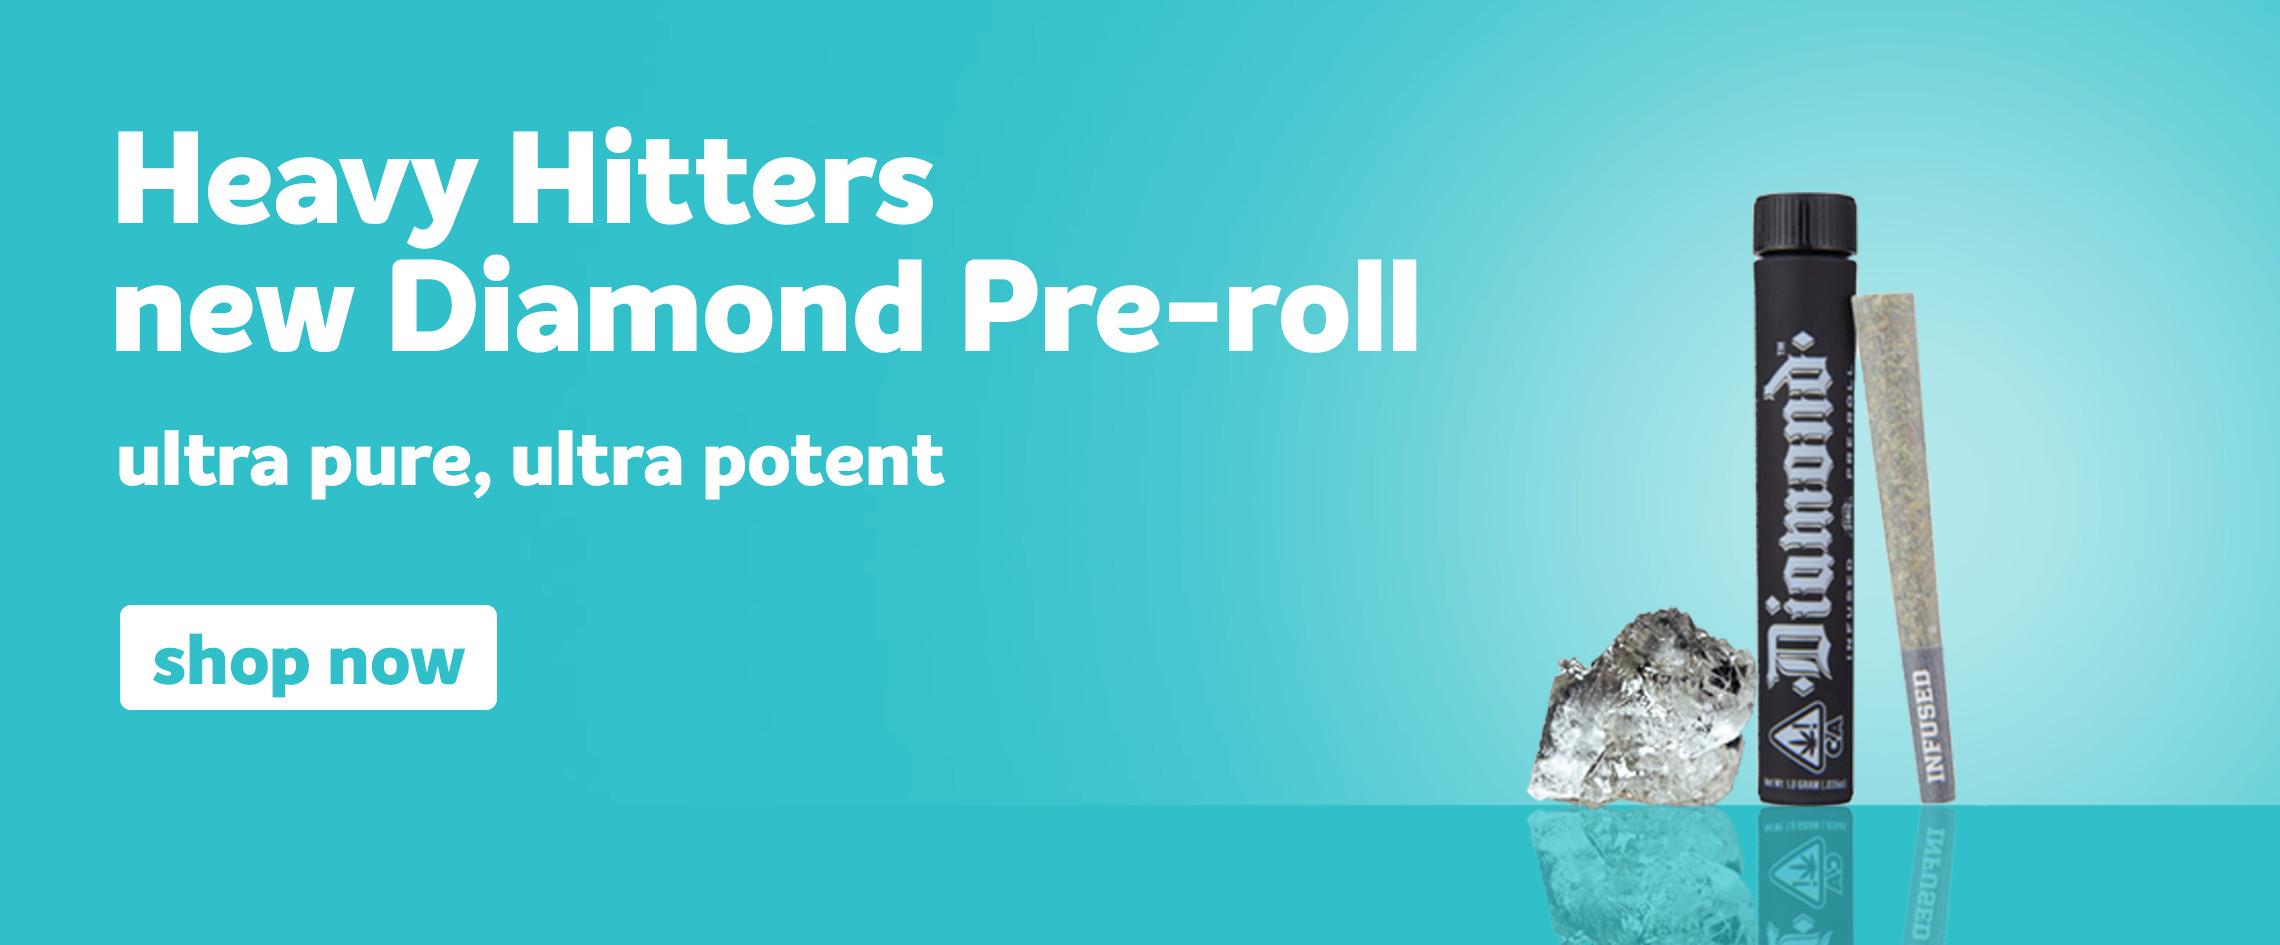 Heavy Hitters Diamond Pre-rolls on Grassdoor Delivery